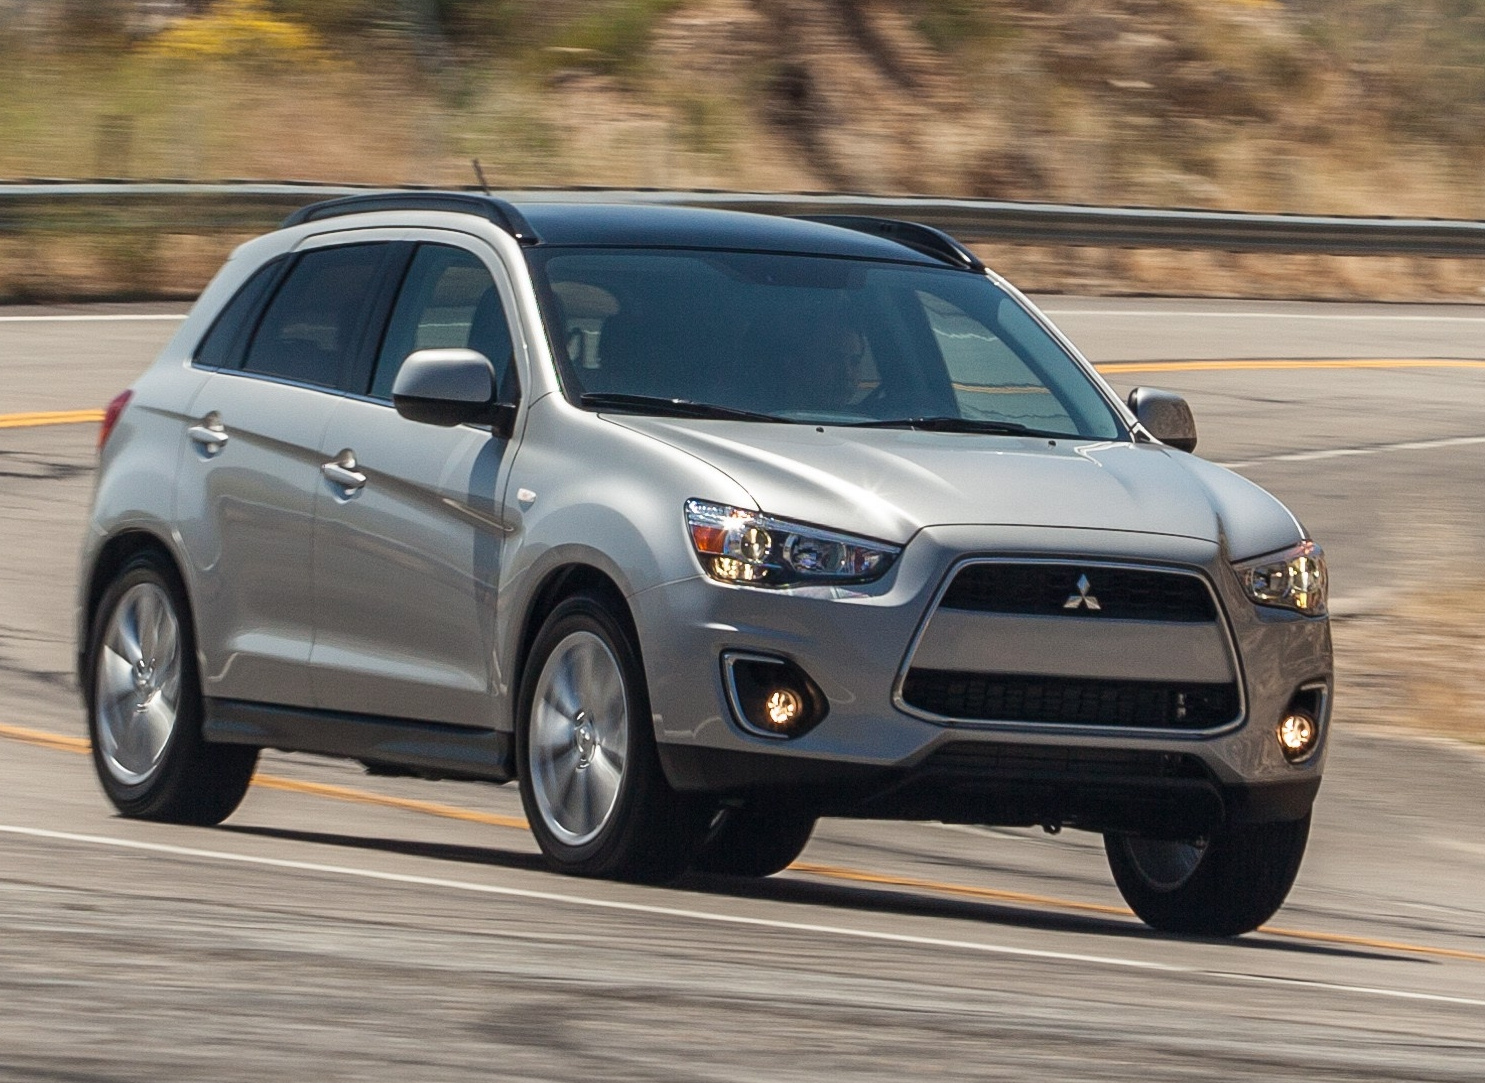 2014 Mitsubishi Outlander Sport - Overview - CarGurus